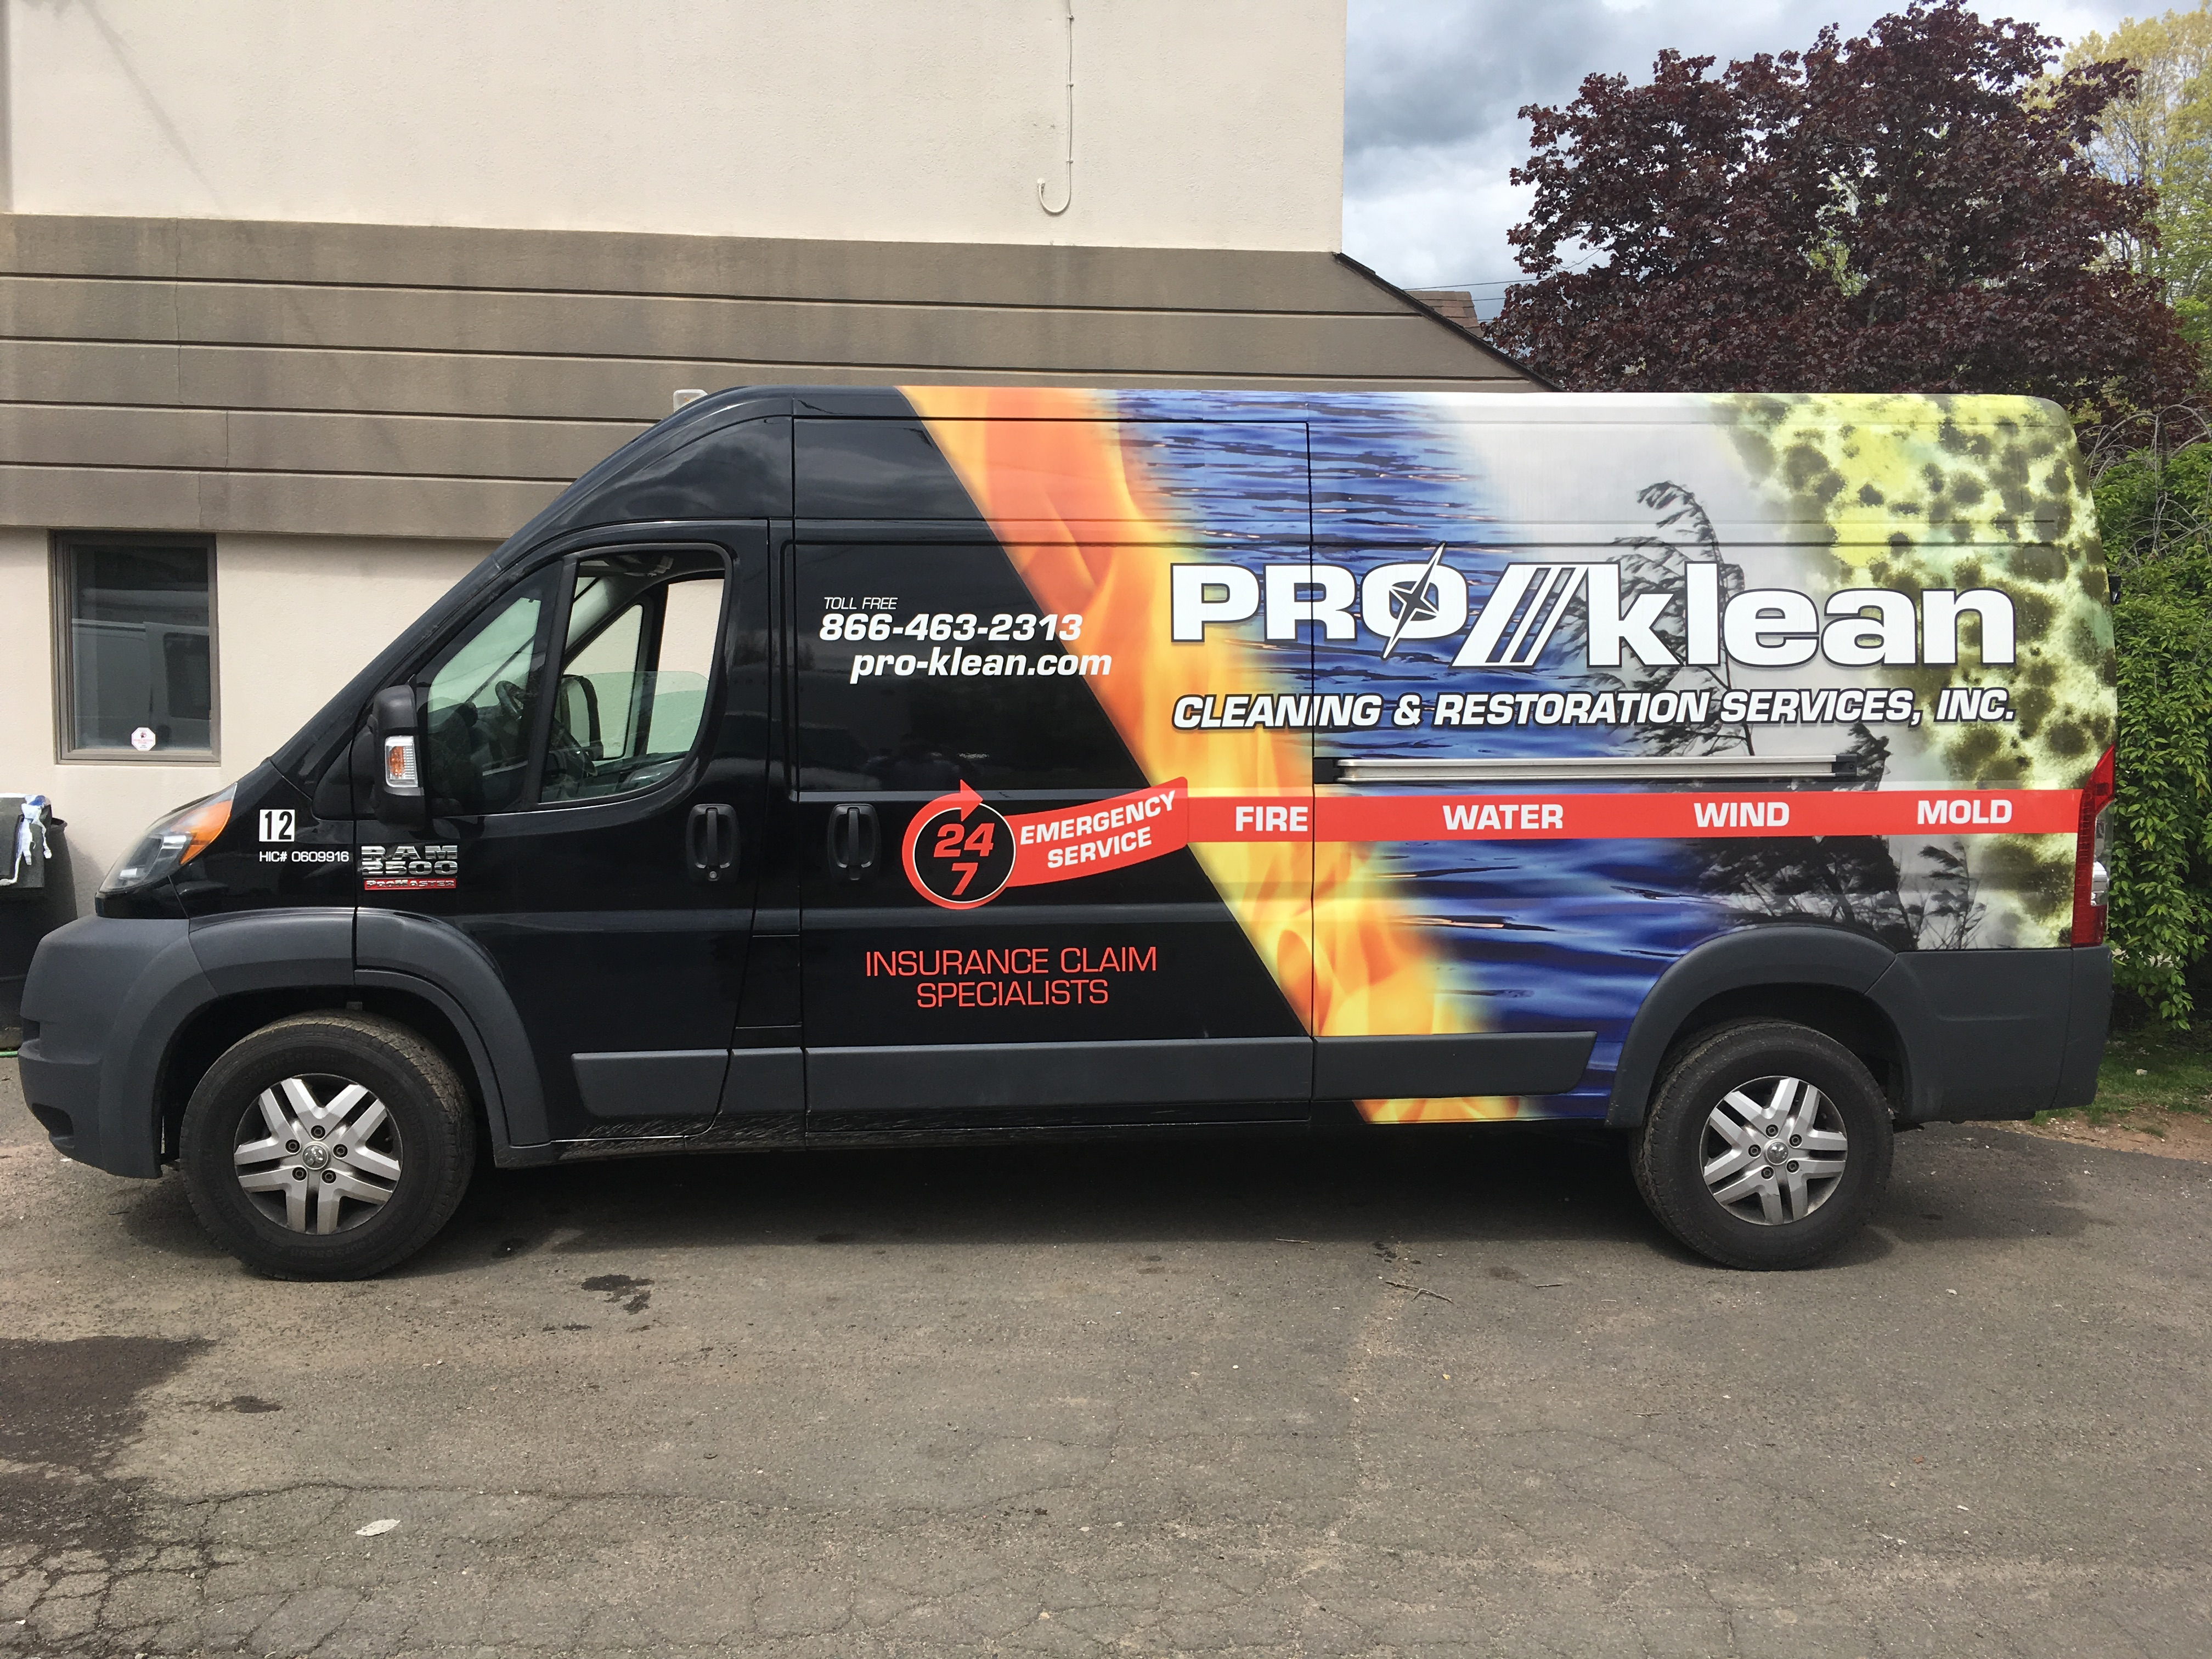 Pro-Klean